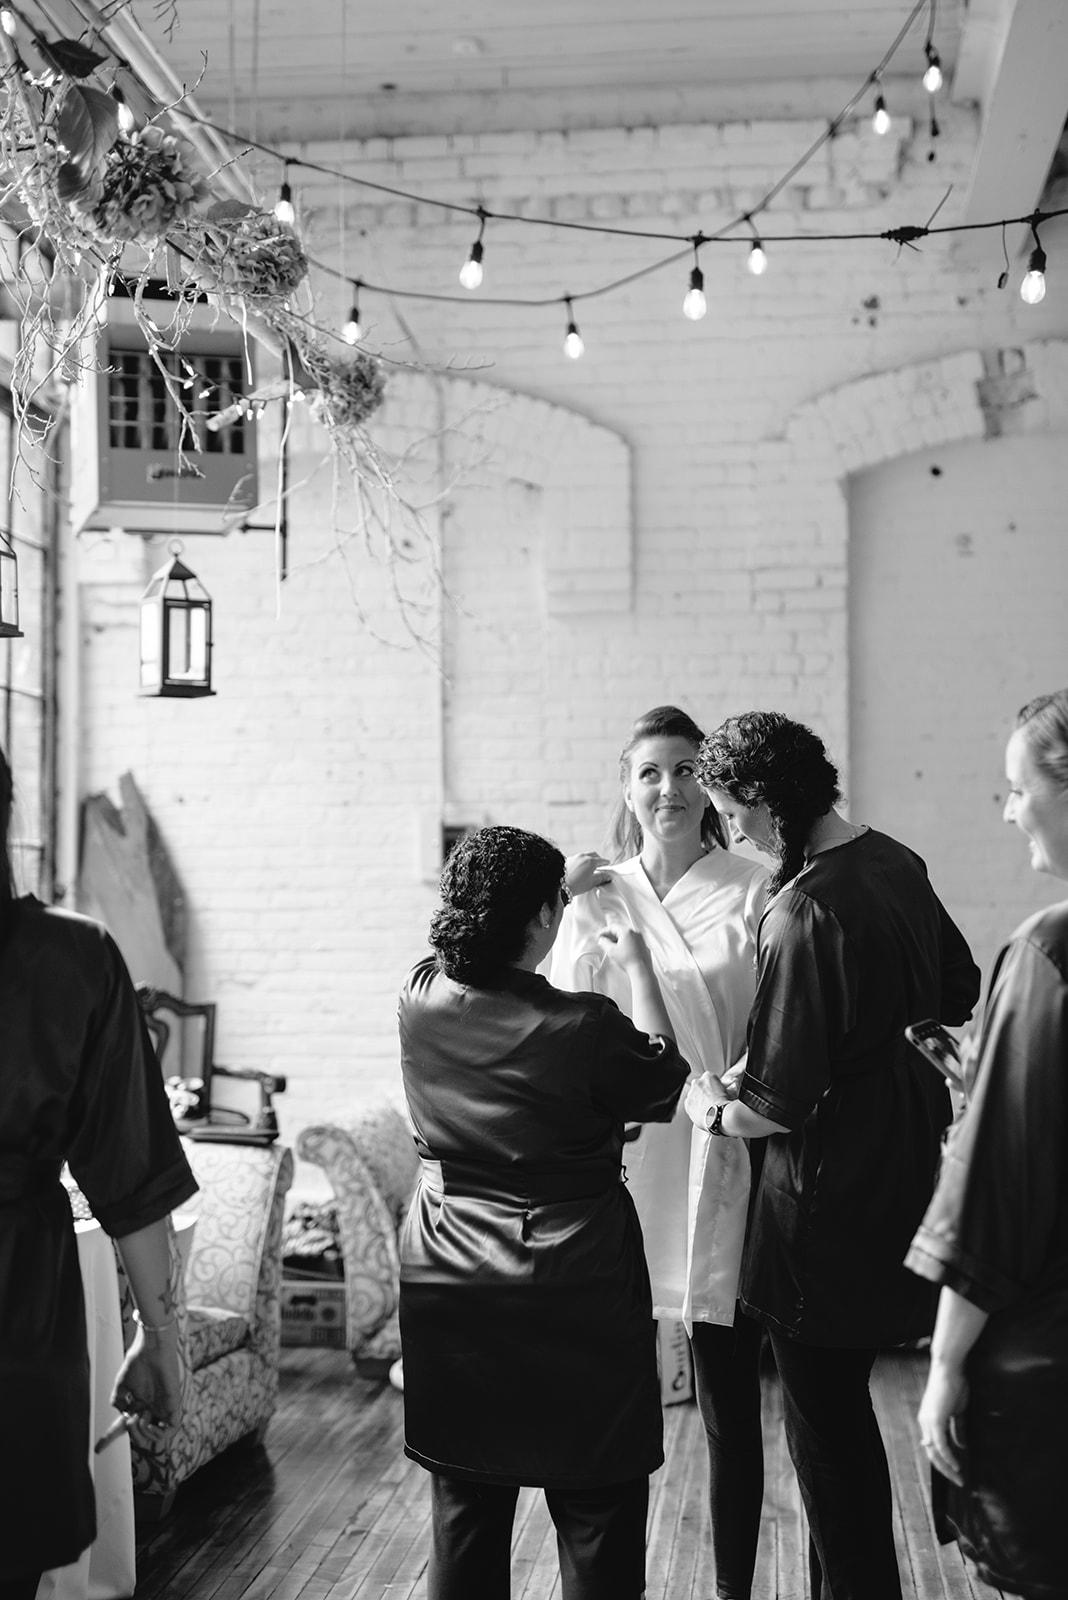 Art Factory Wedding- Industrial Chic- Audrey+Ryan- Paterson NJ- Olivia Christina Photo (9).jpg